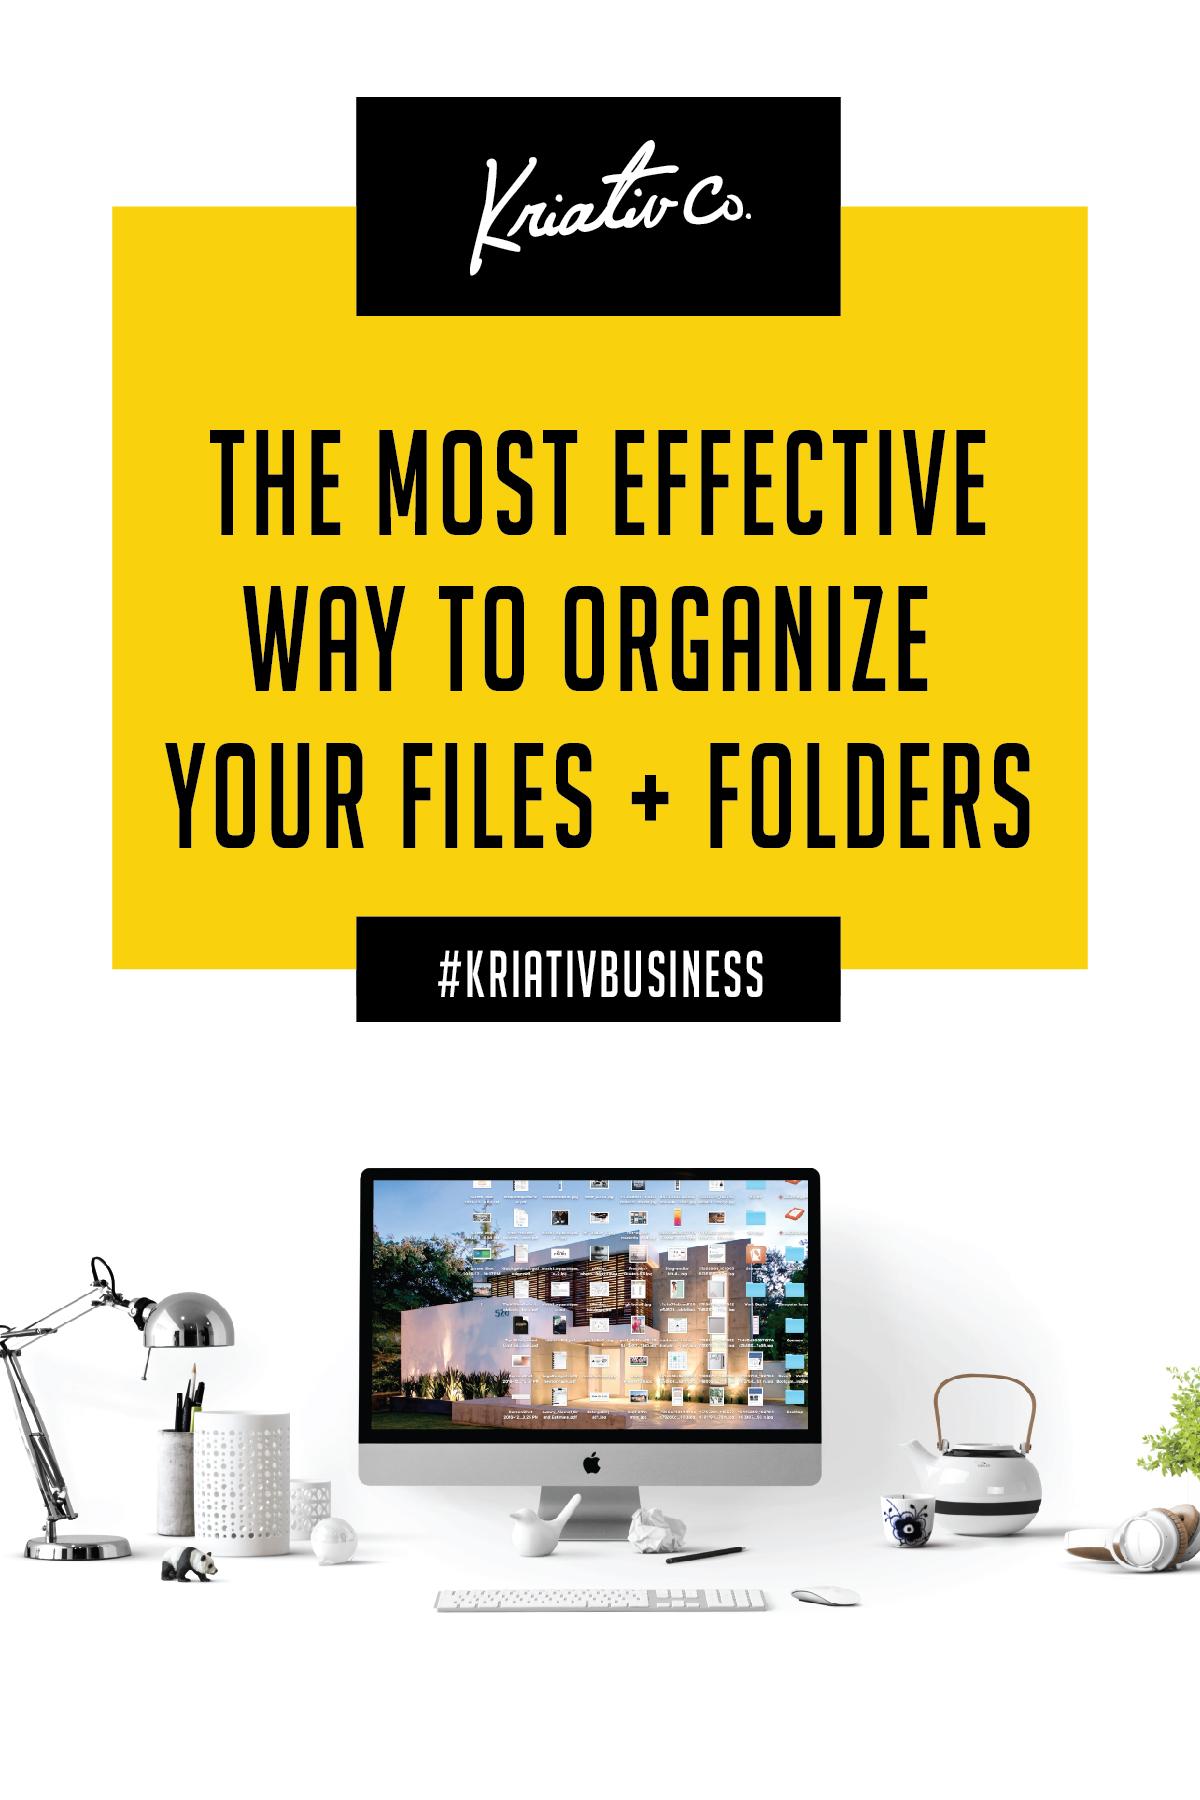 Kriativ_Co_Organize_Files_Folders_01a-02.jpg